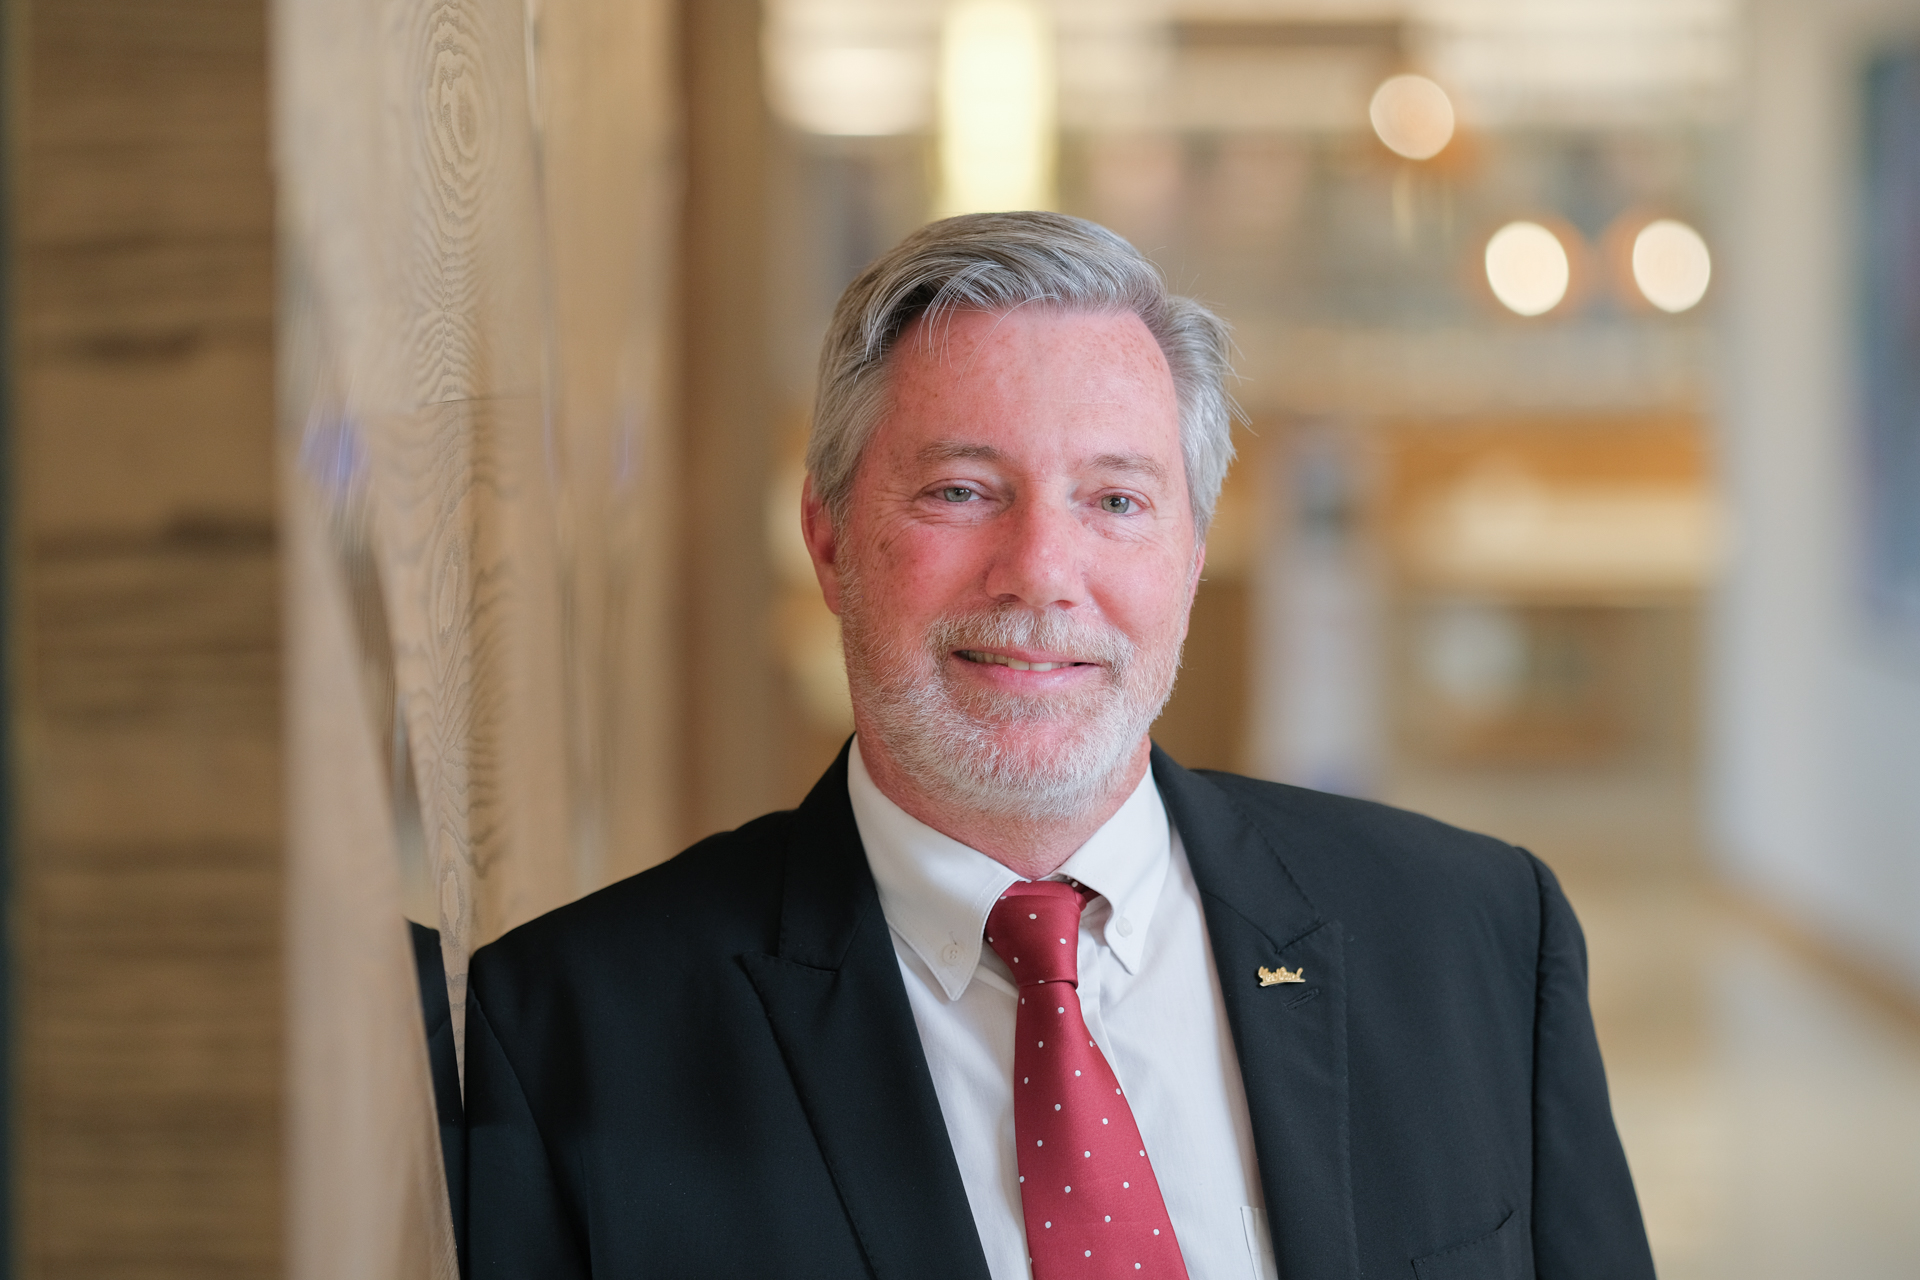 Rob van der Velden is New GM for  Radisson Hotel & Convention Centre, Johannesburg O.R. Tambo